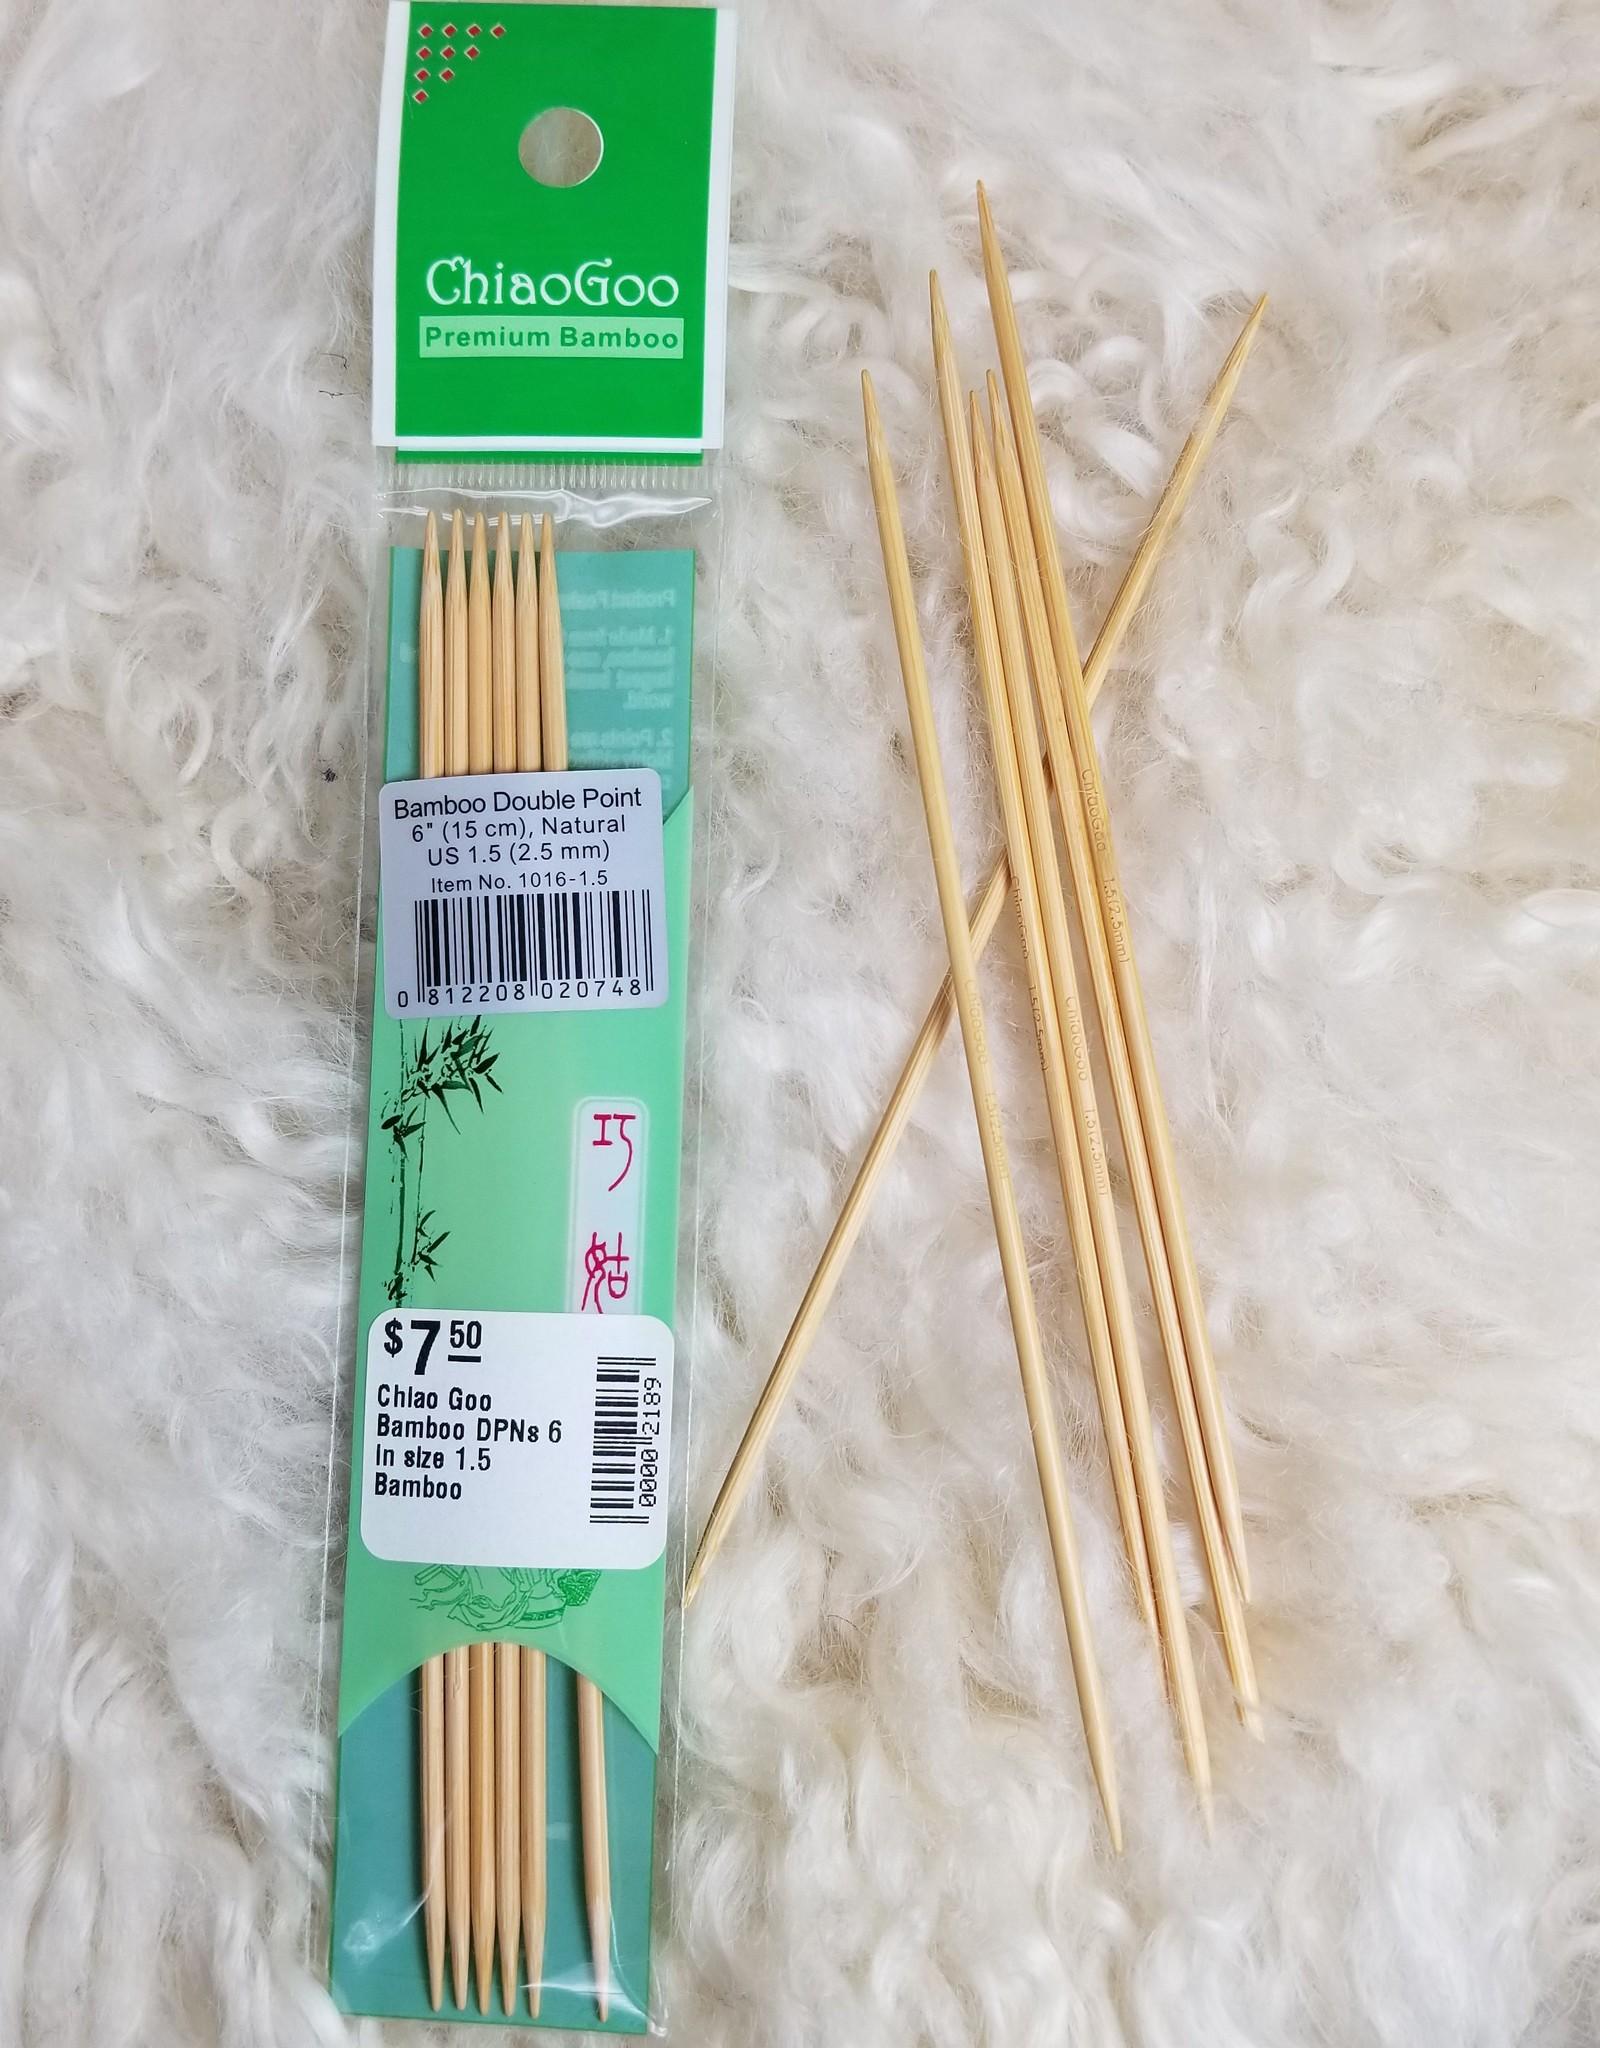 "Chiao Goo Bamboo 6"" Sock DPNs"